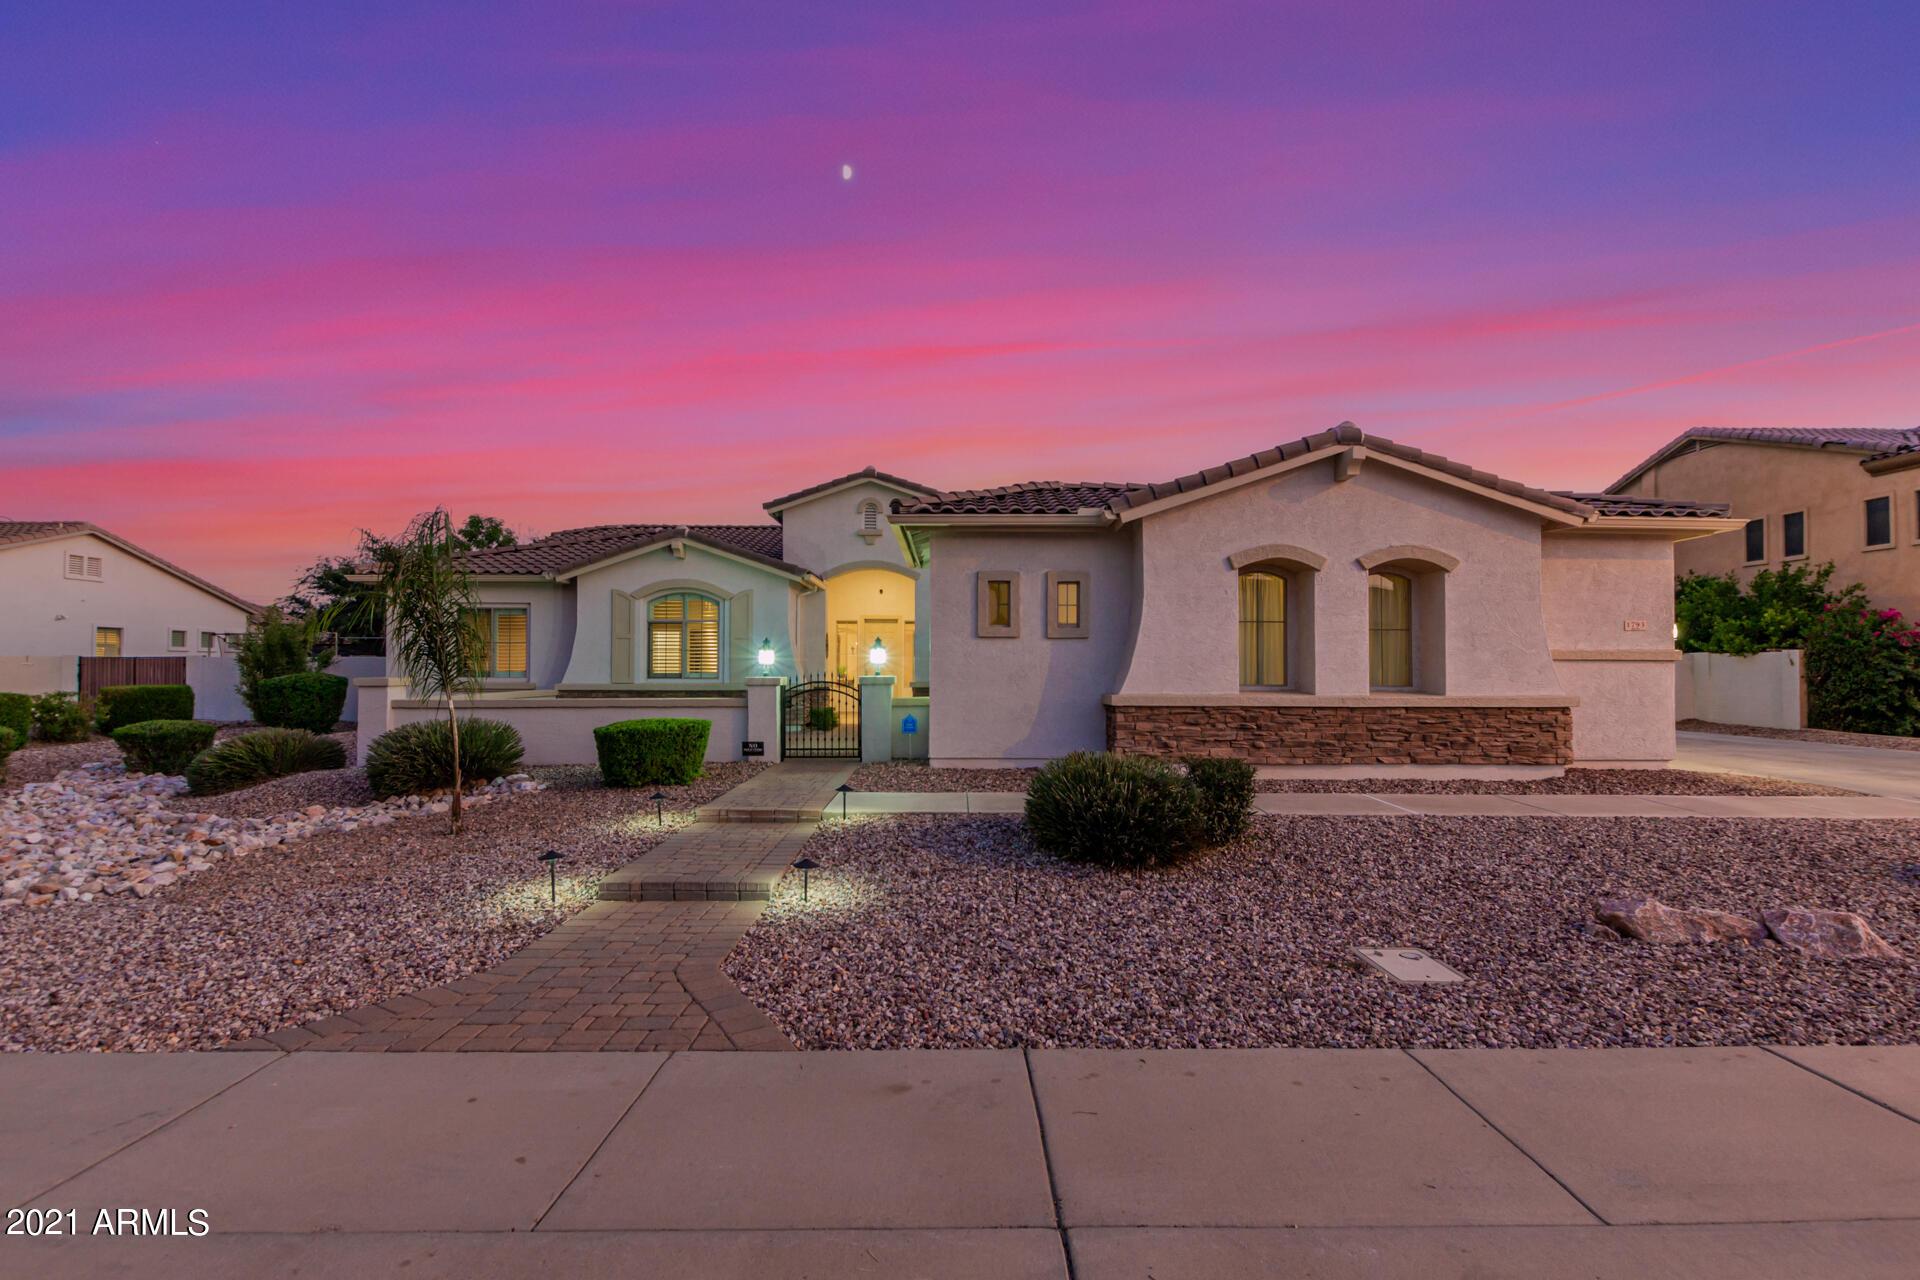 1793 GEMINI Place, Chandler, Arizona 85249, 4 Bedrooms Bedrooms, ,2.5 BathroomsBathrooms,Residential,For Sale,GEMINI,6293993